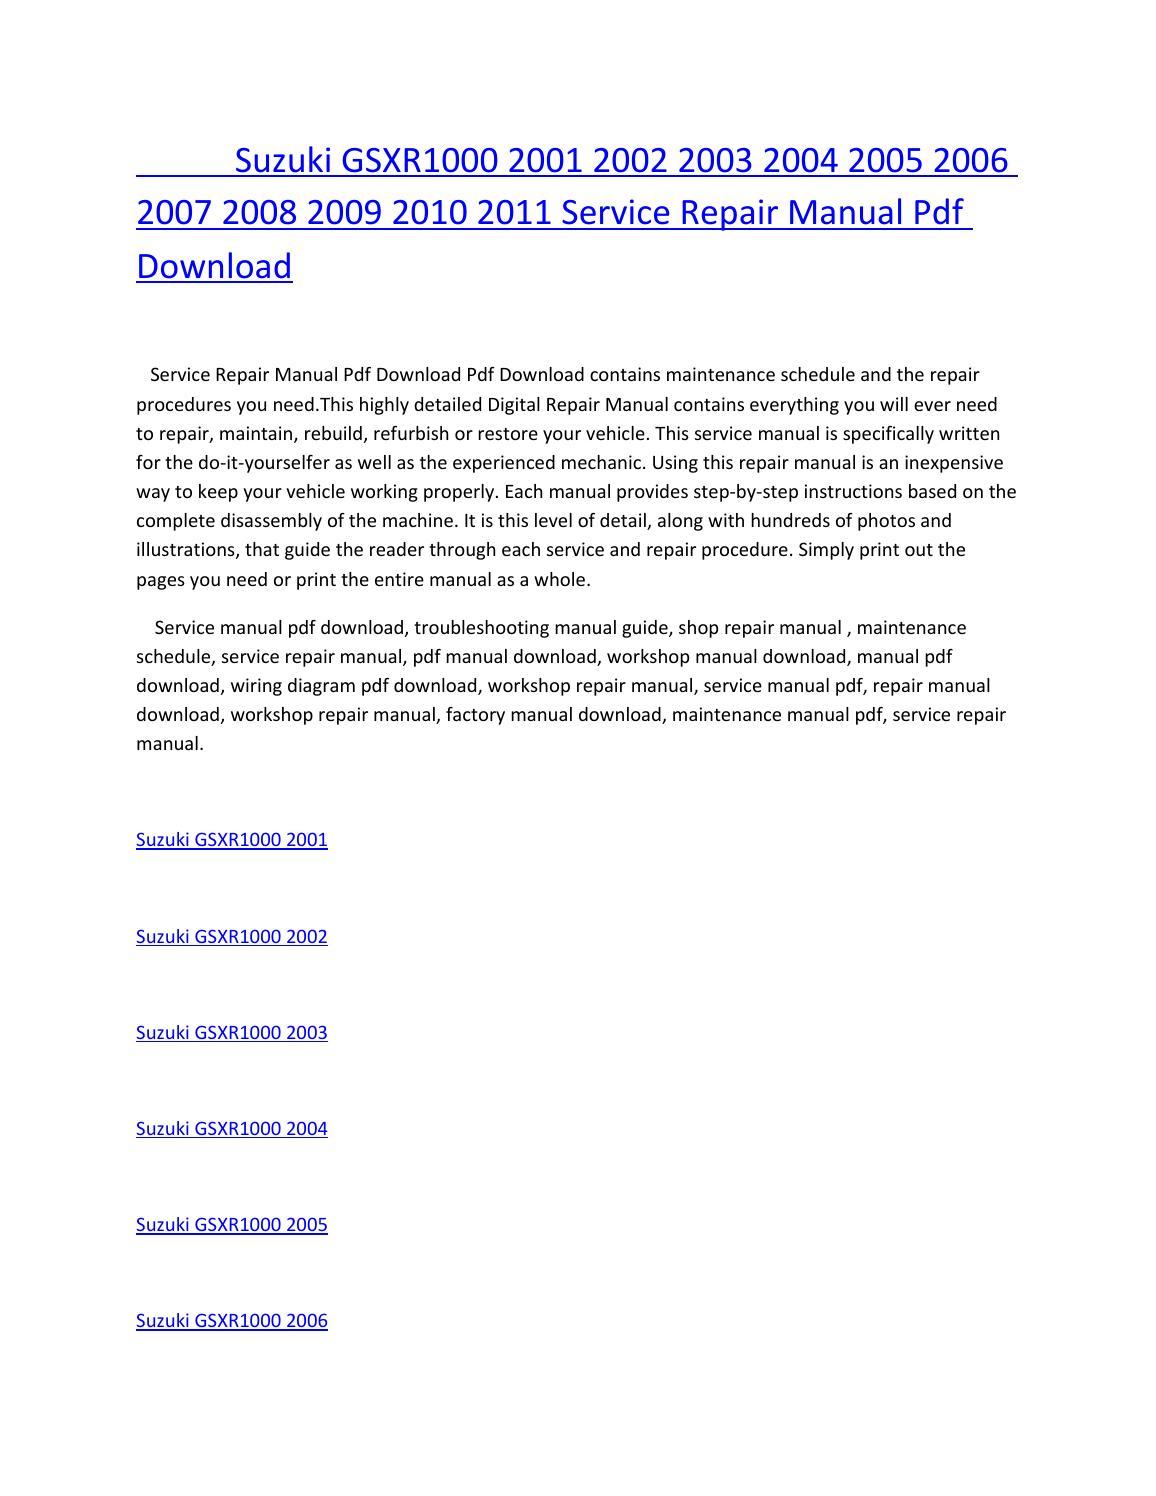 hight resolution of suzuki gsxr1000 2001 2002 2003 2004 2005 2006 2007 2008 2009 2010 2011 service repair manual pdf dow by amurgului issuu